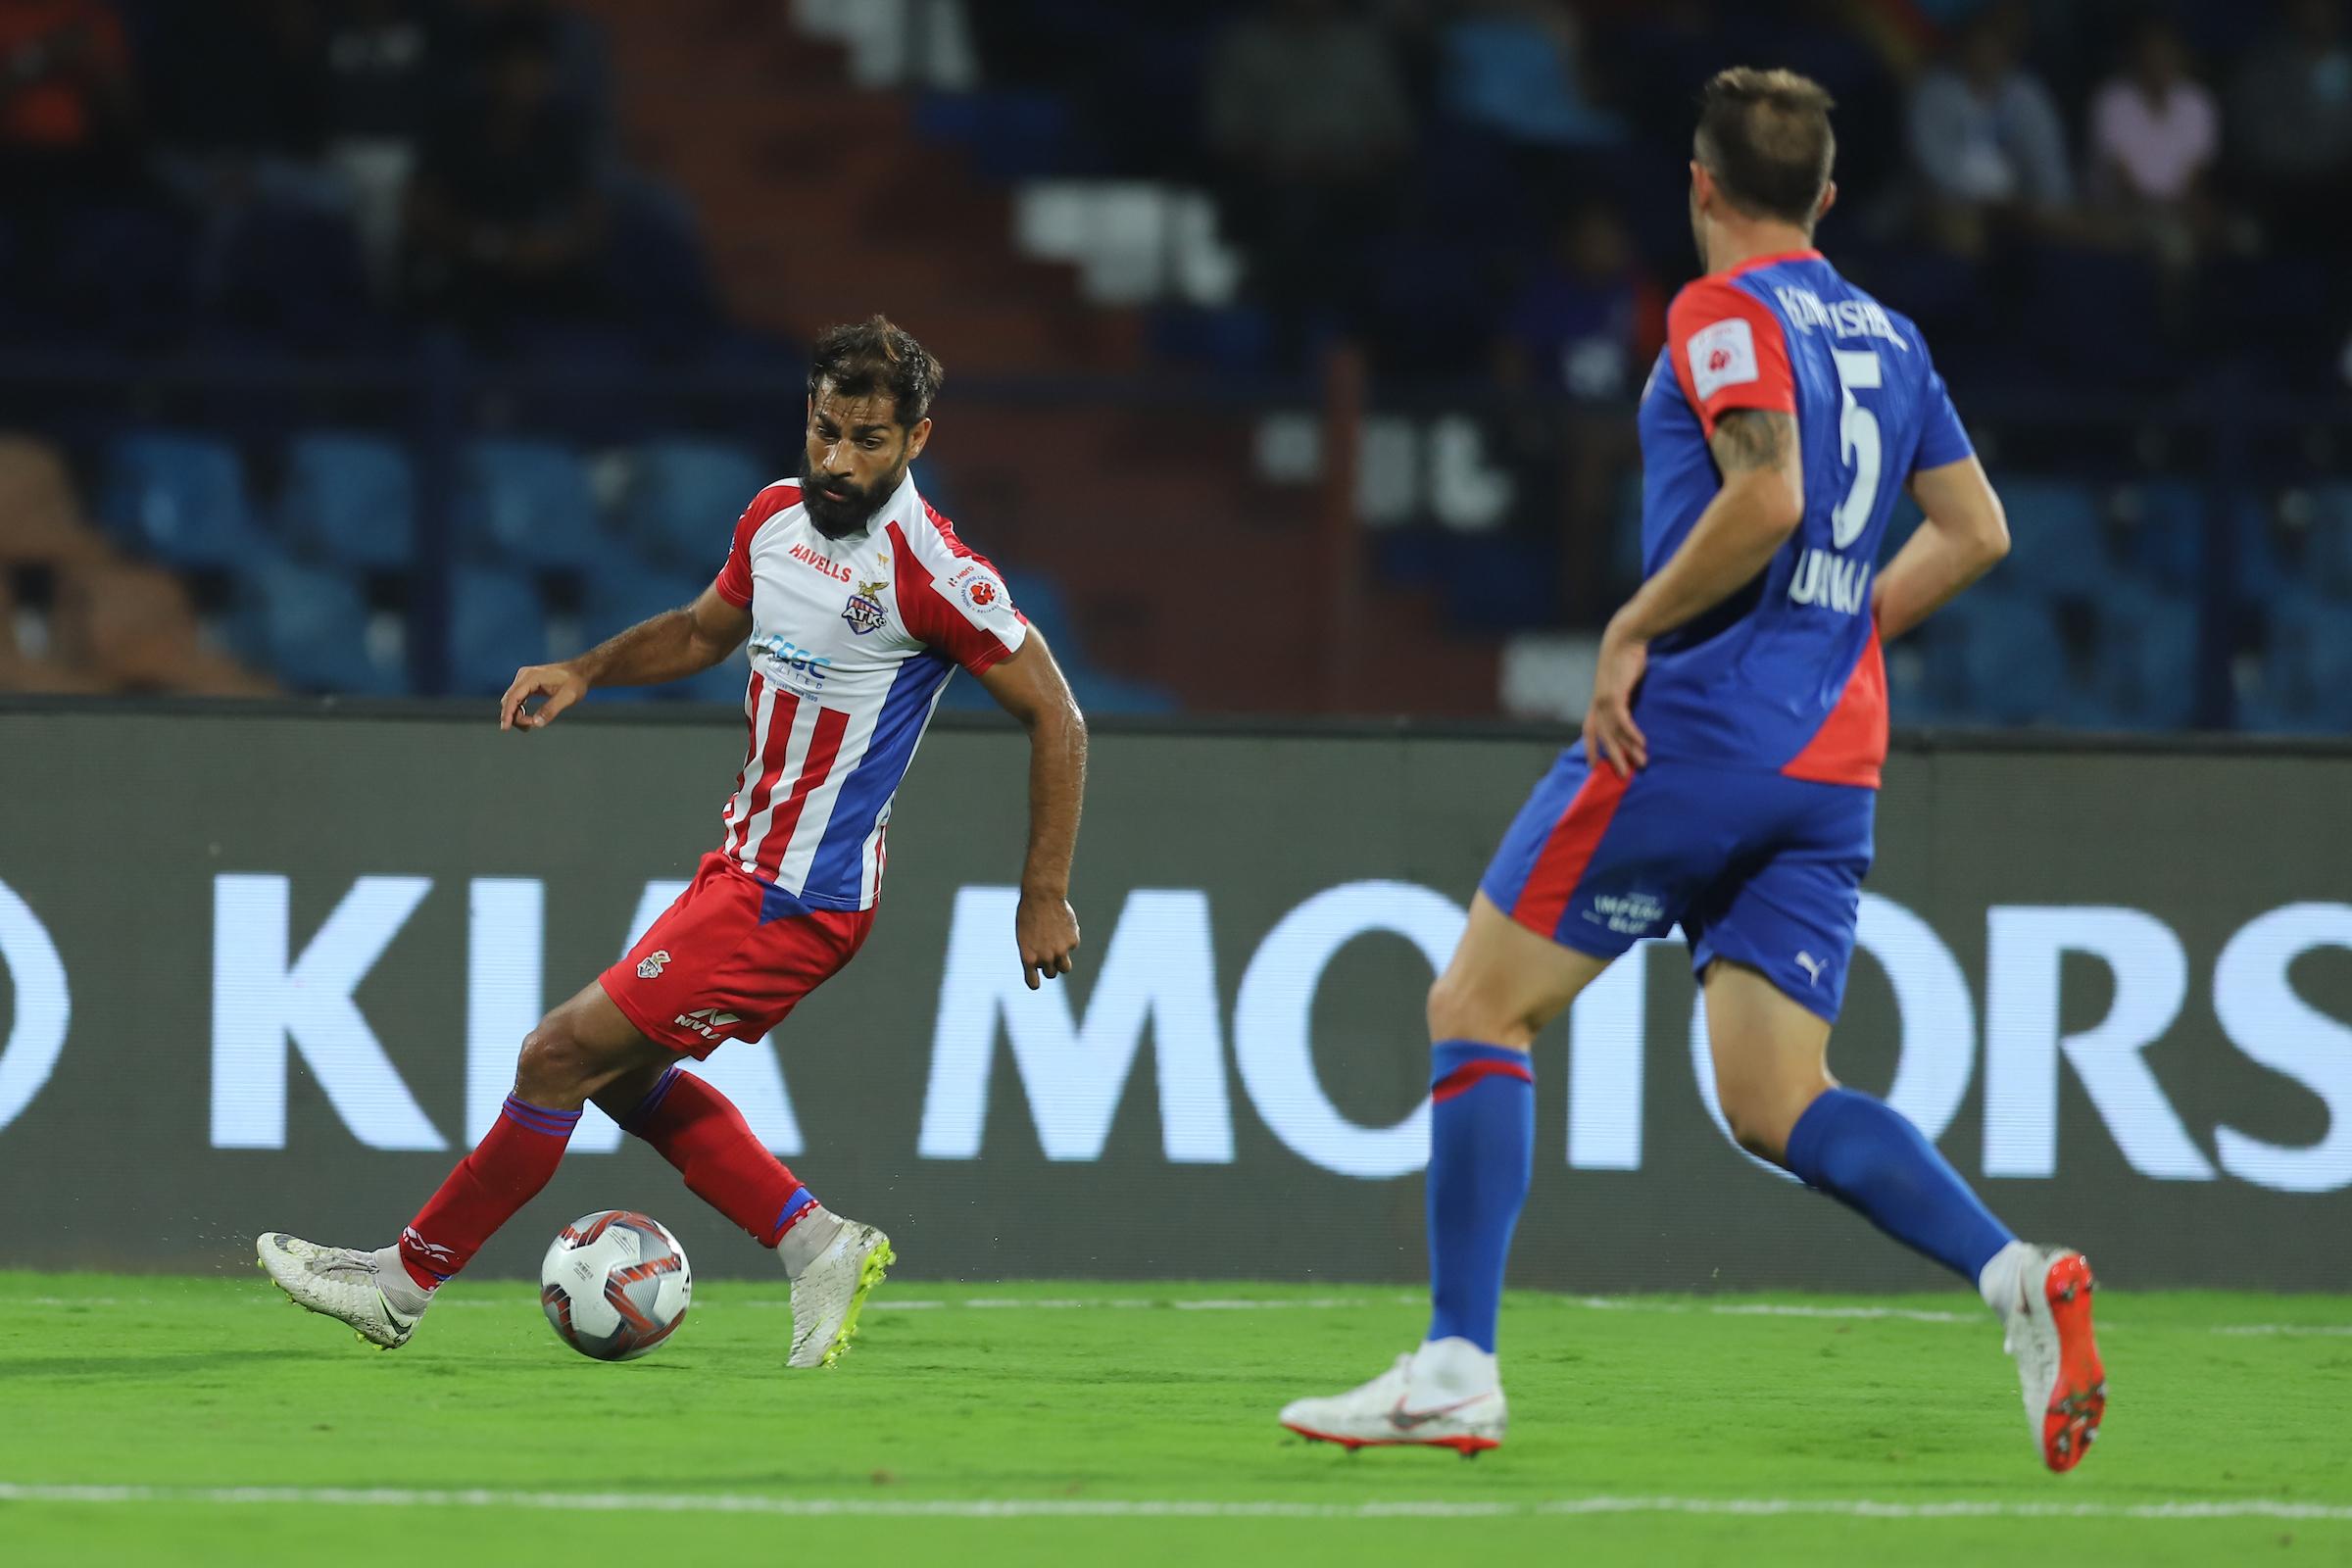 Balwant Singh Bengaluru Kolkata ISL